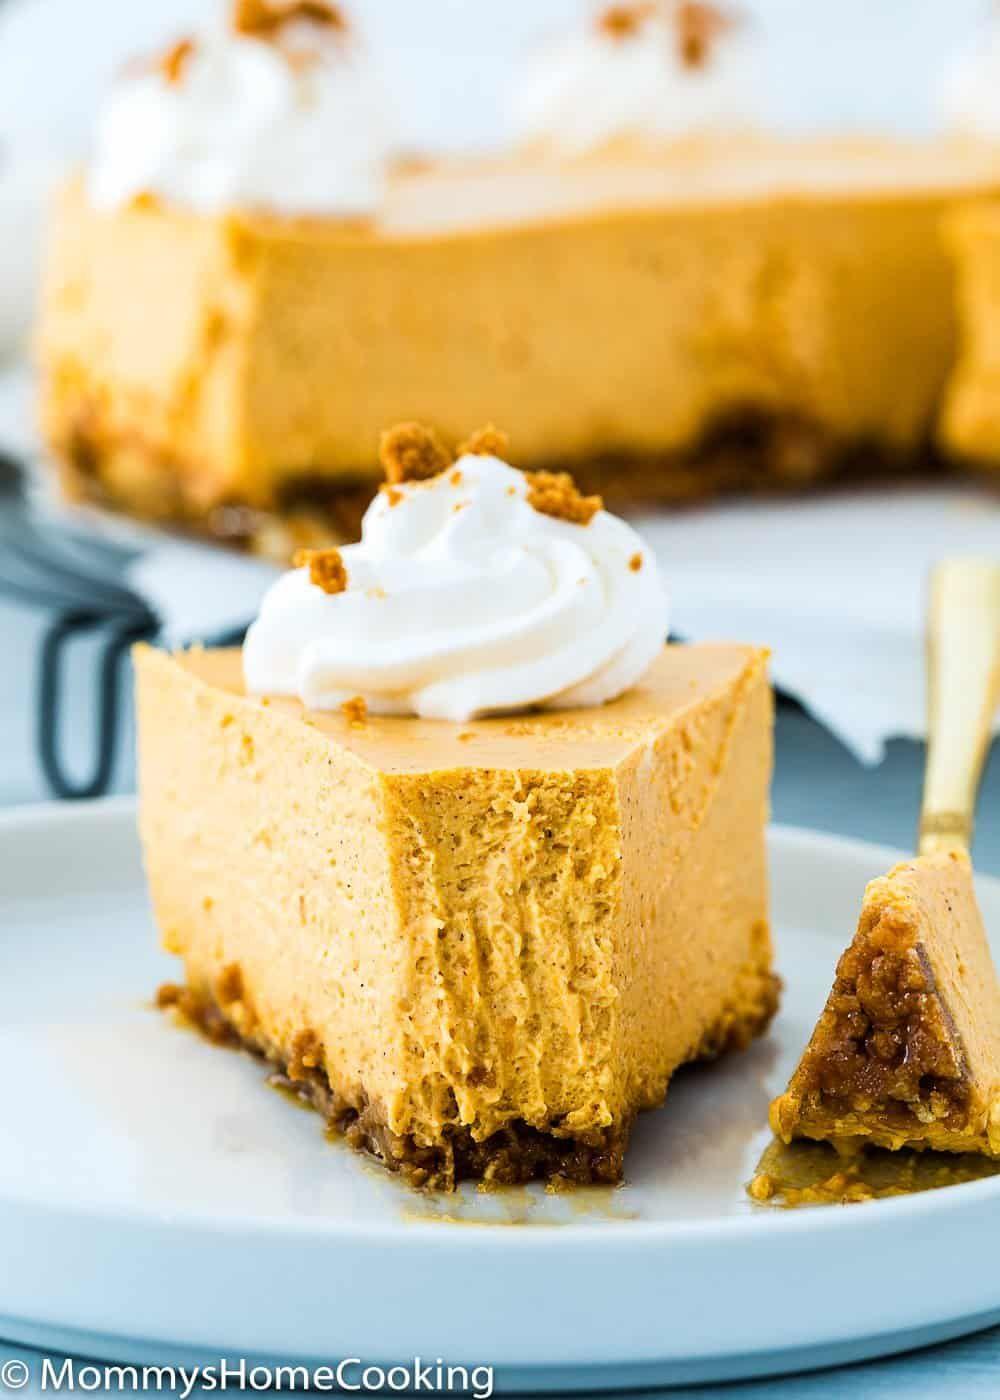 Eggless Pumpkin Cheesecake Recipe Recipe In 2020 Cheesecake Recipes Pumpkin Cheesecake Recipes Pumpkin Cheesecake